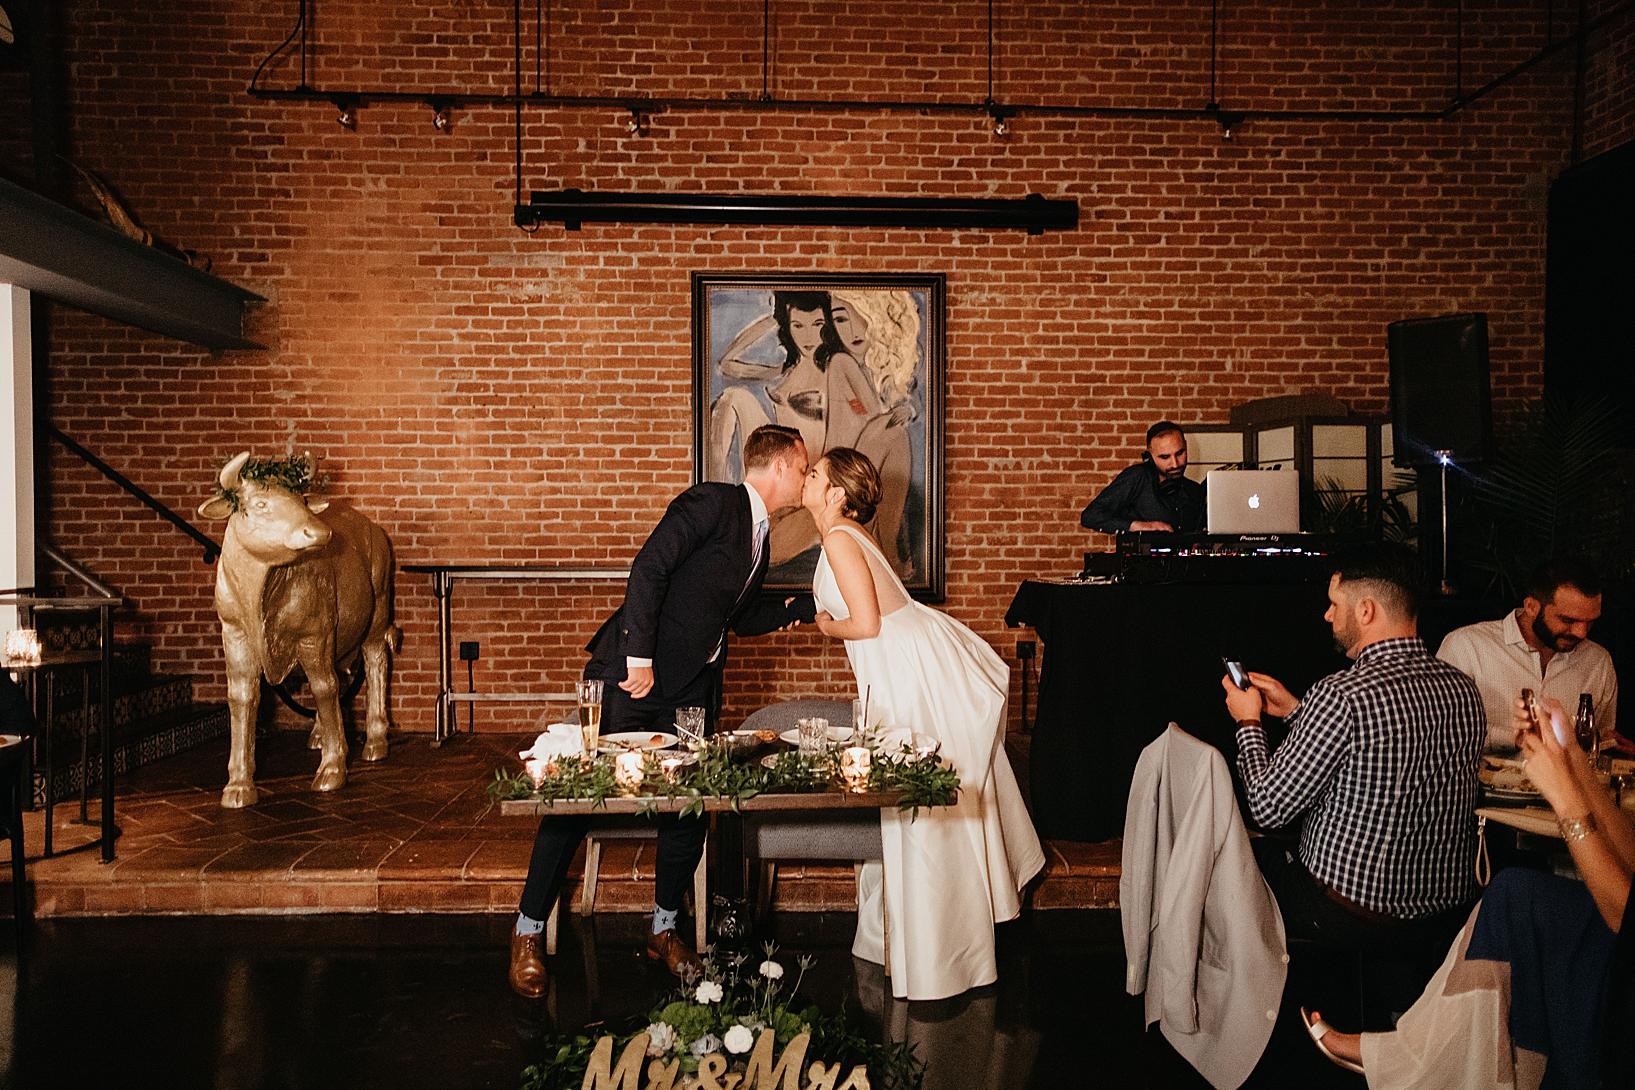 Herb-and-Wood-Wedding-99.jpg